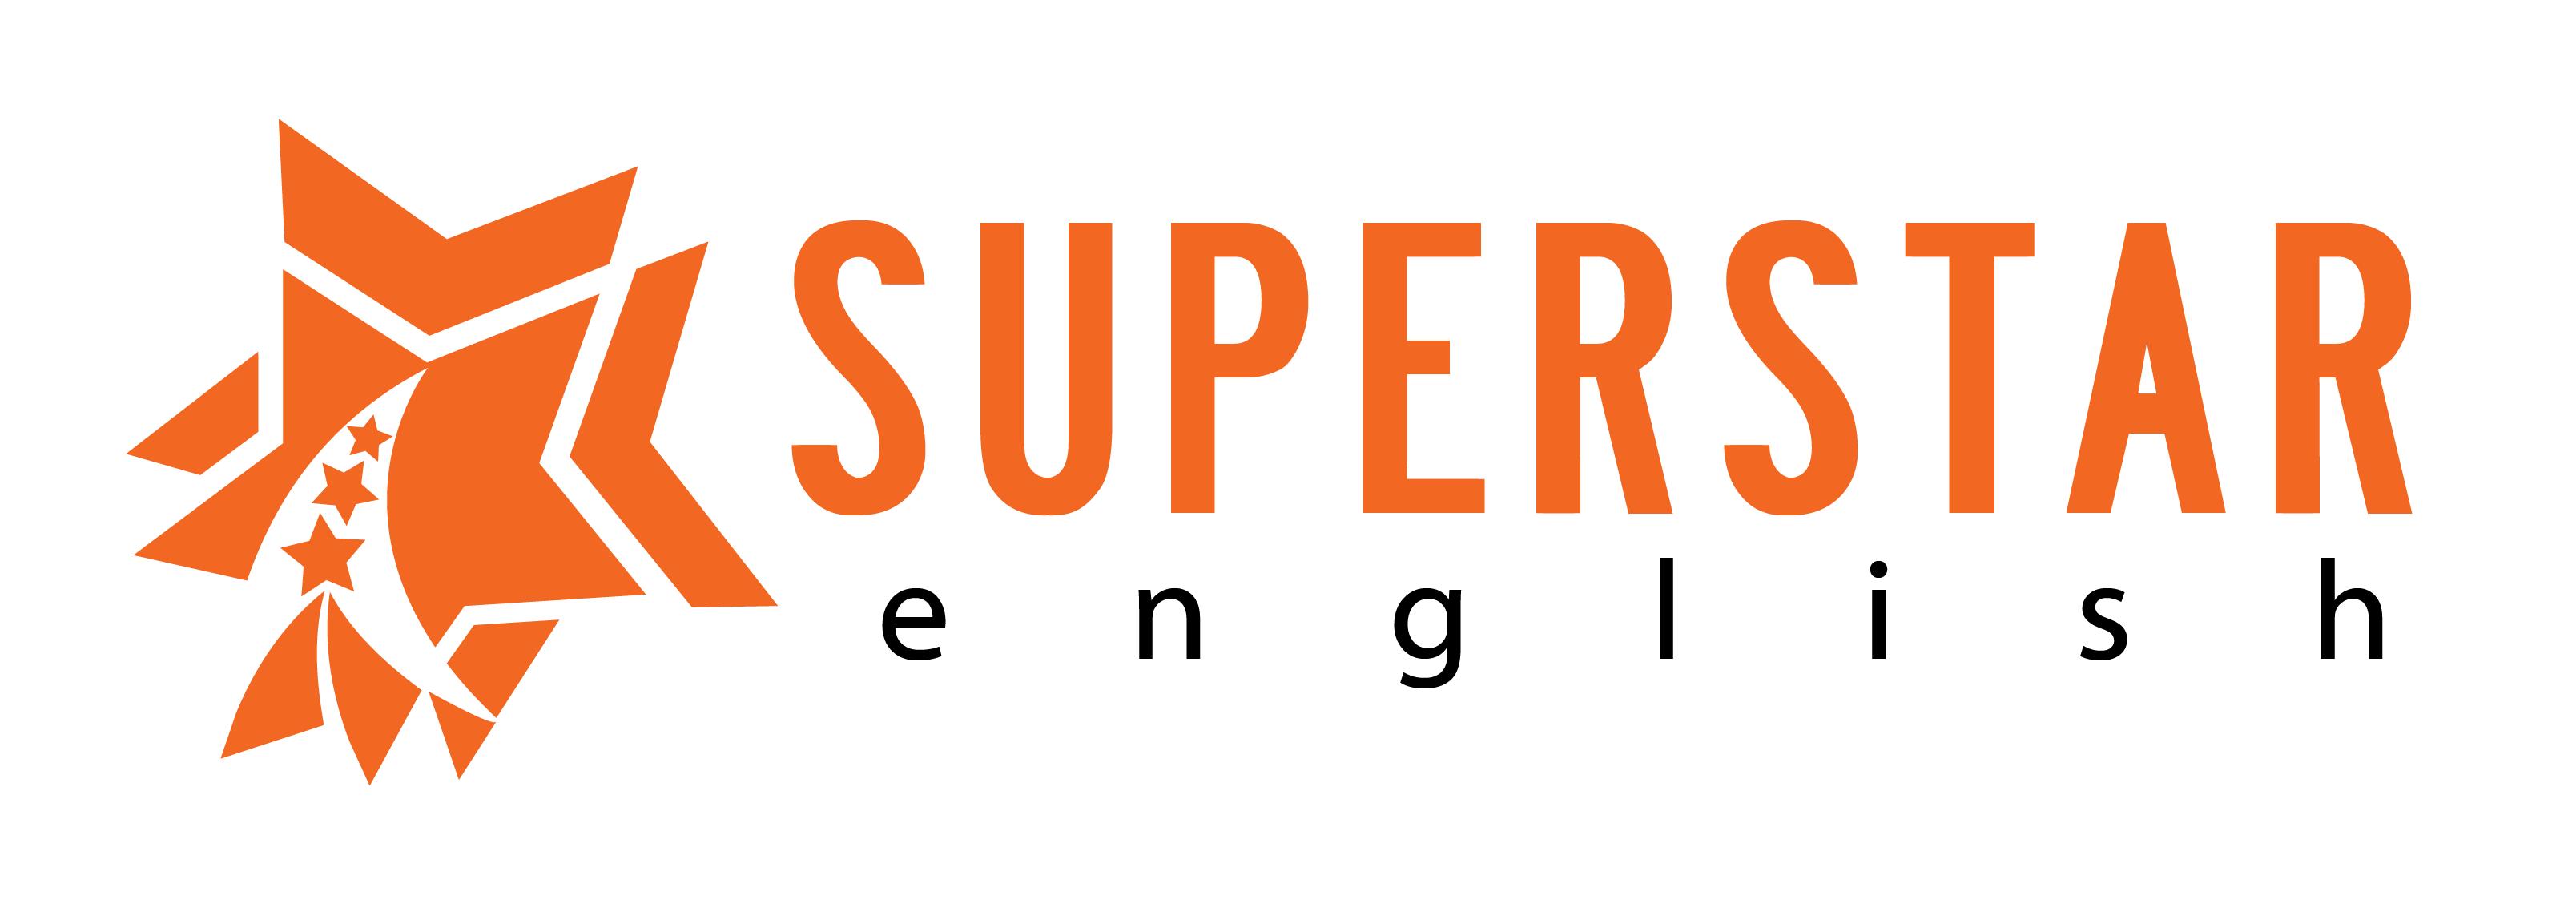 Superstar english logo white